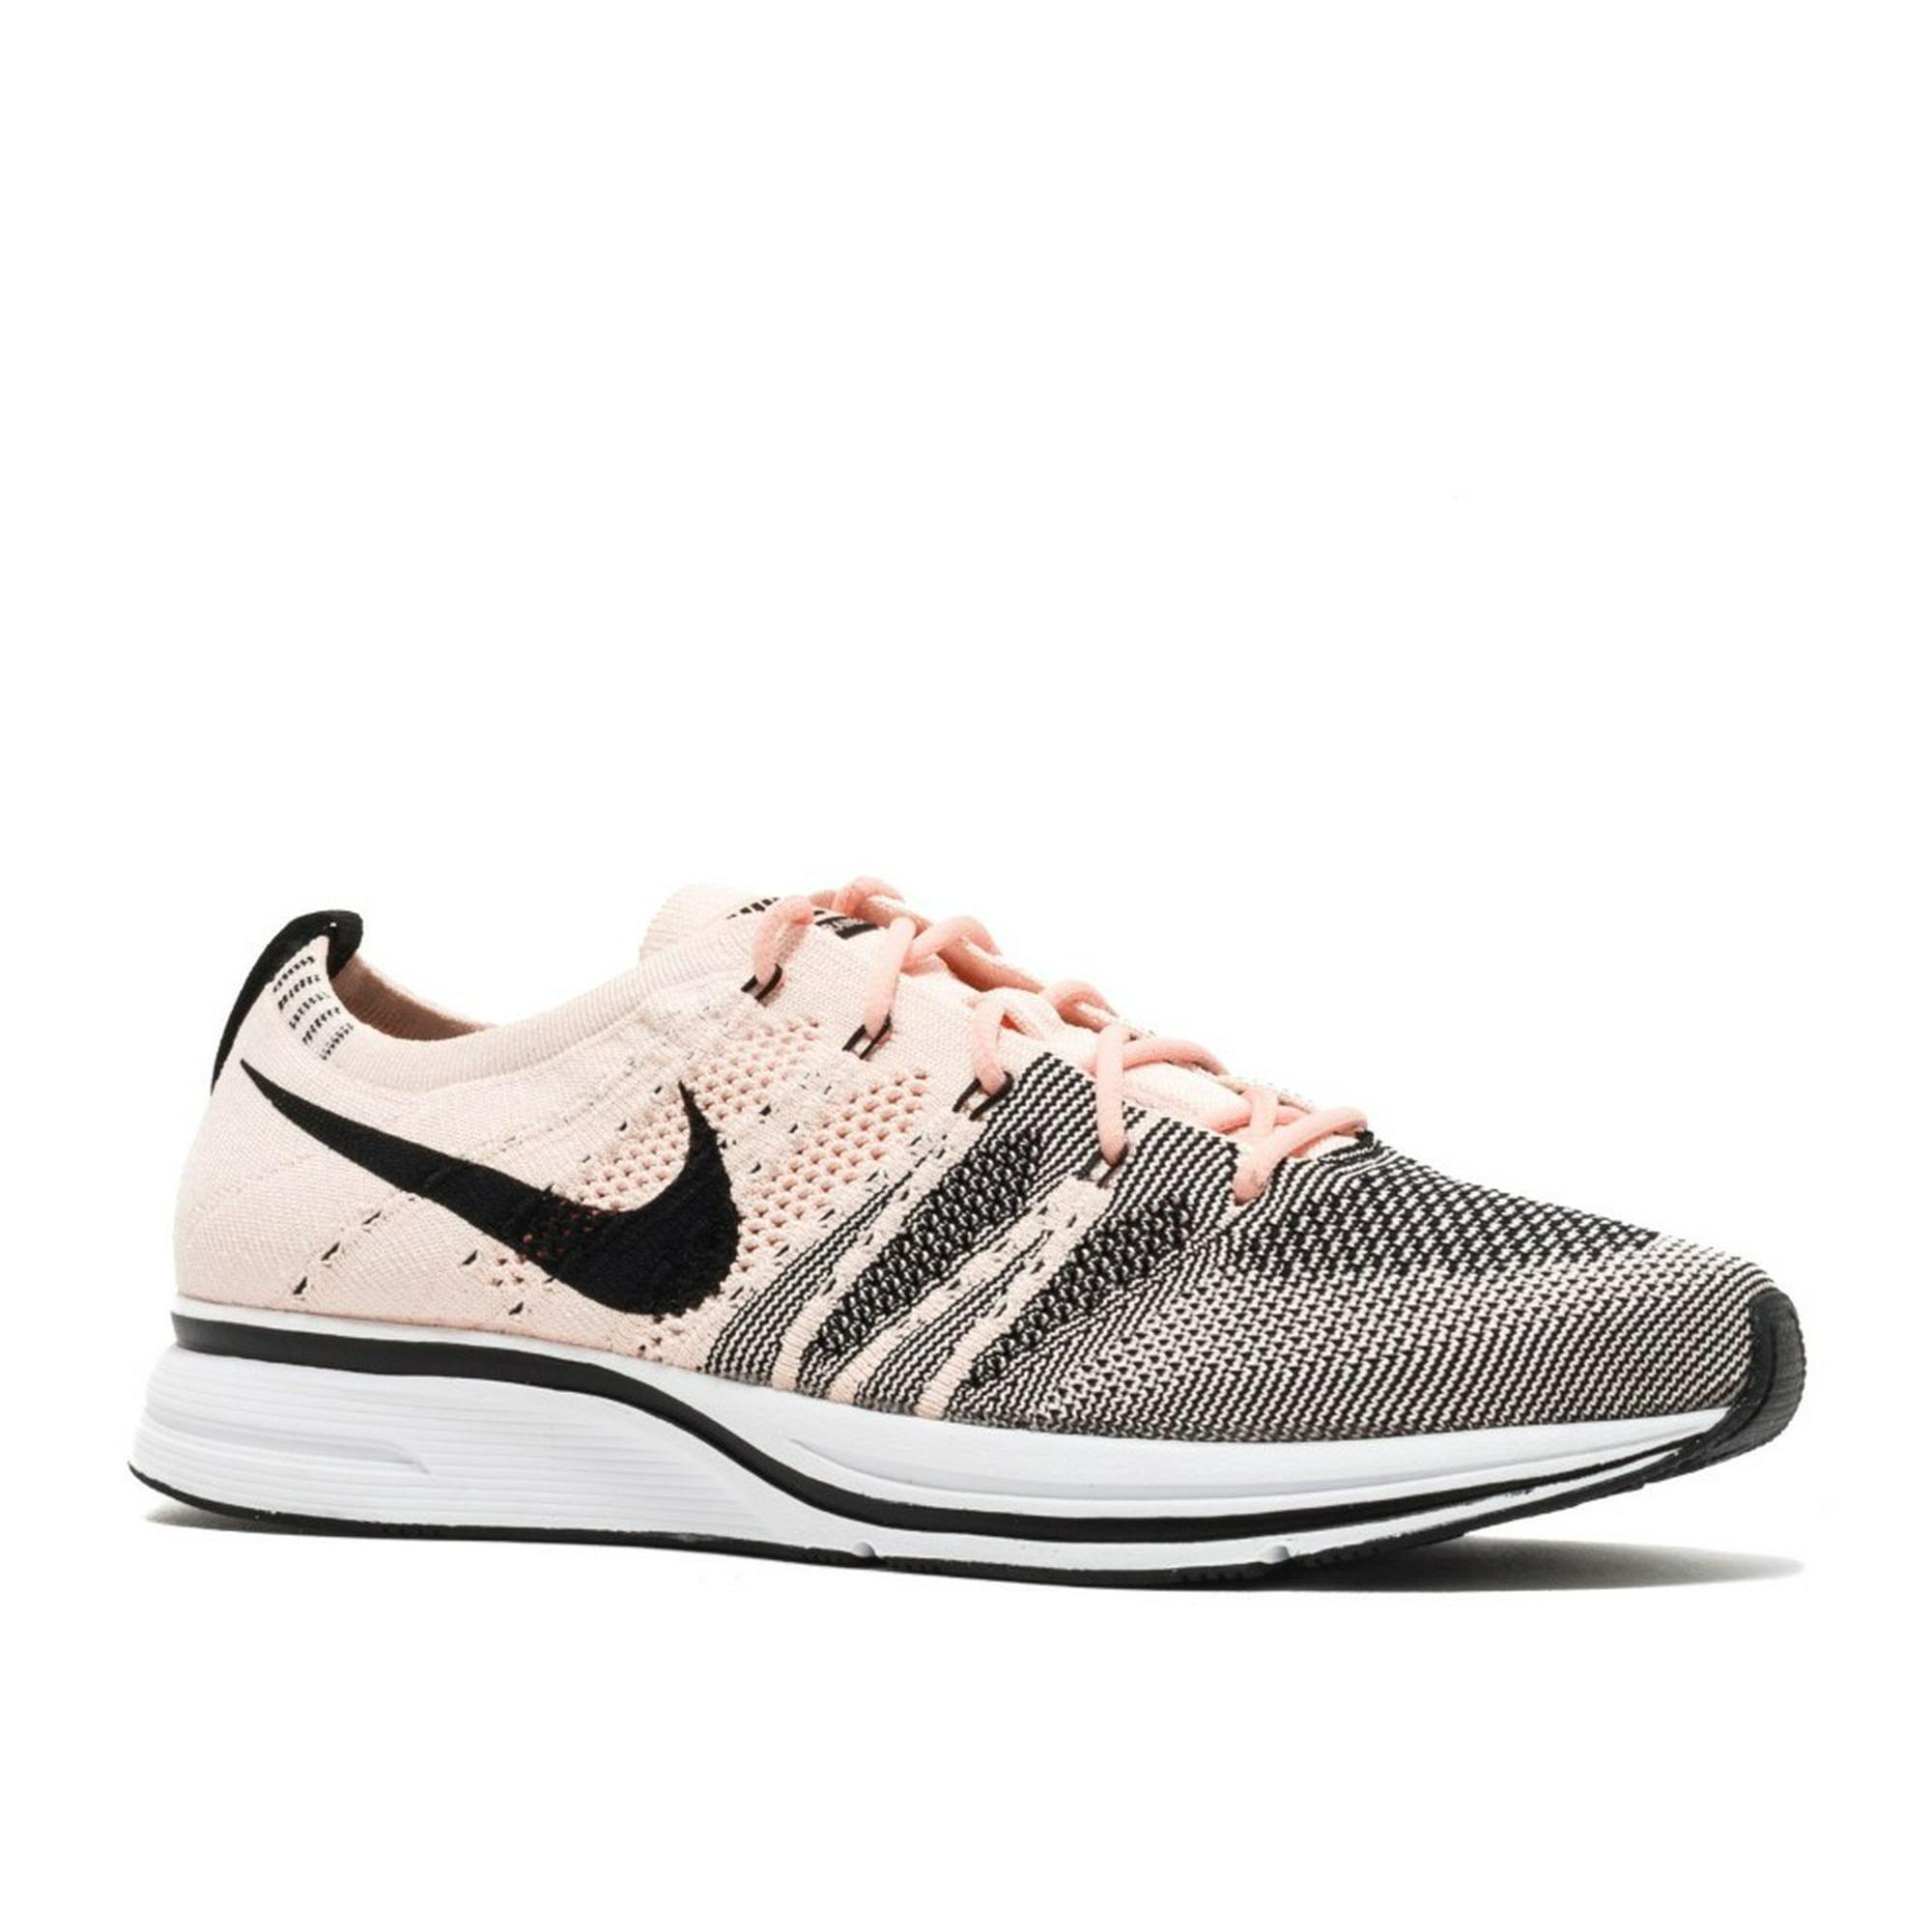 f0d796351ea00 Nike - Men - Nike Flyknit Trainer  Sunset Tint  - Ah8396-600 - Size ...